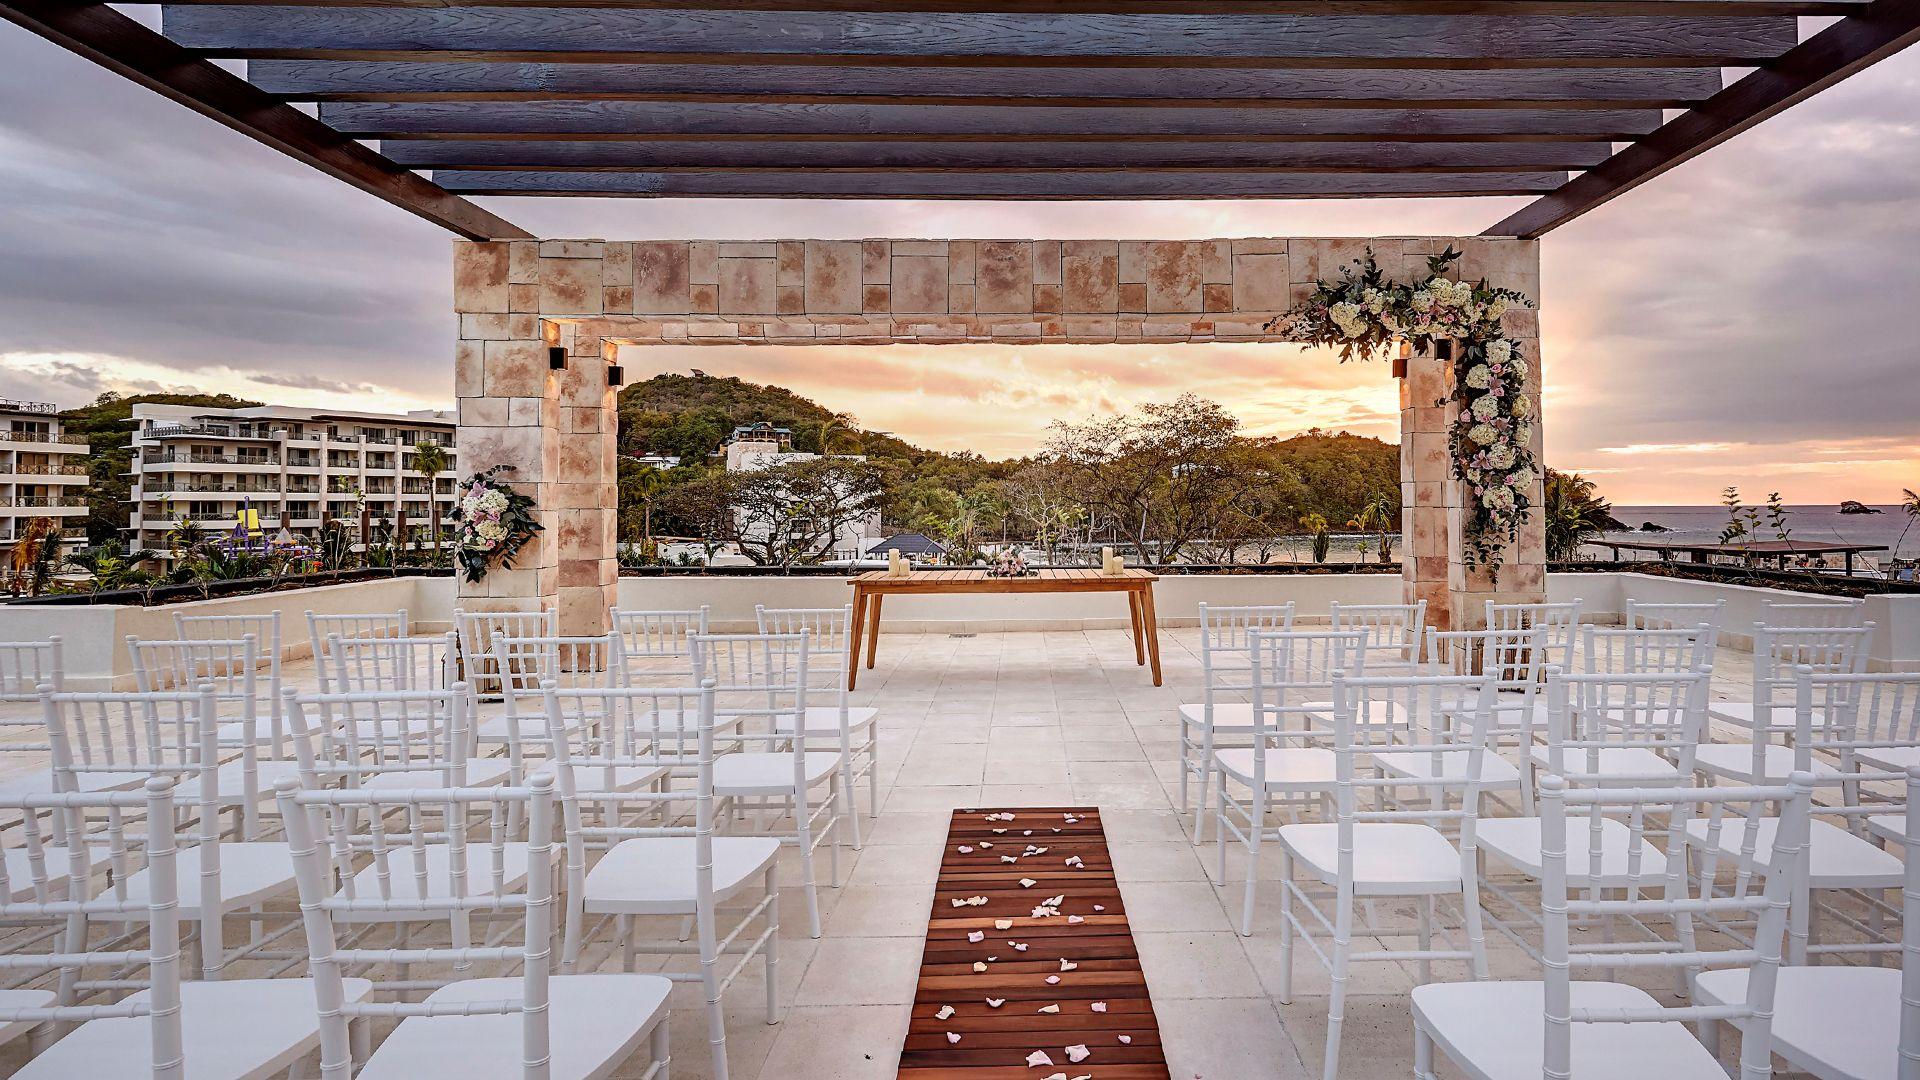 Win a FREE Destination Wedding All inclusive wedding